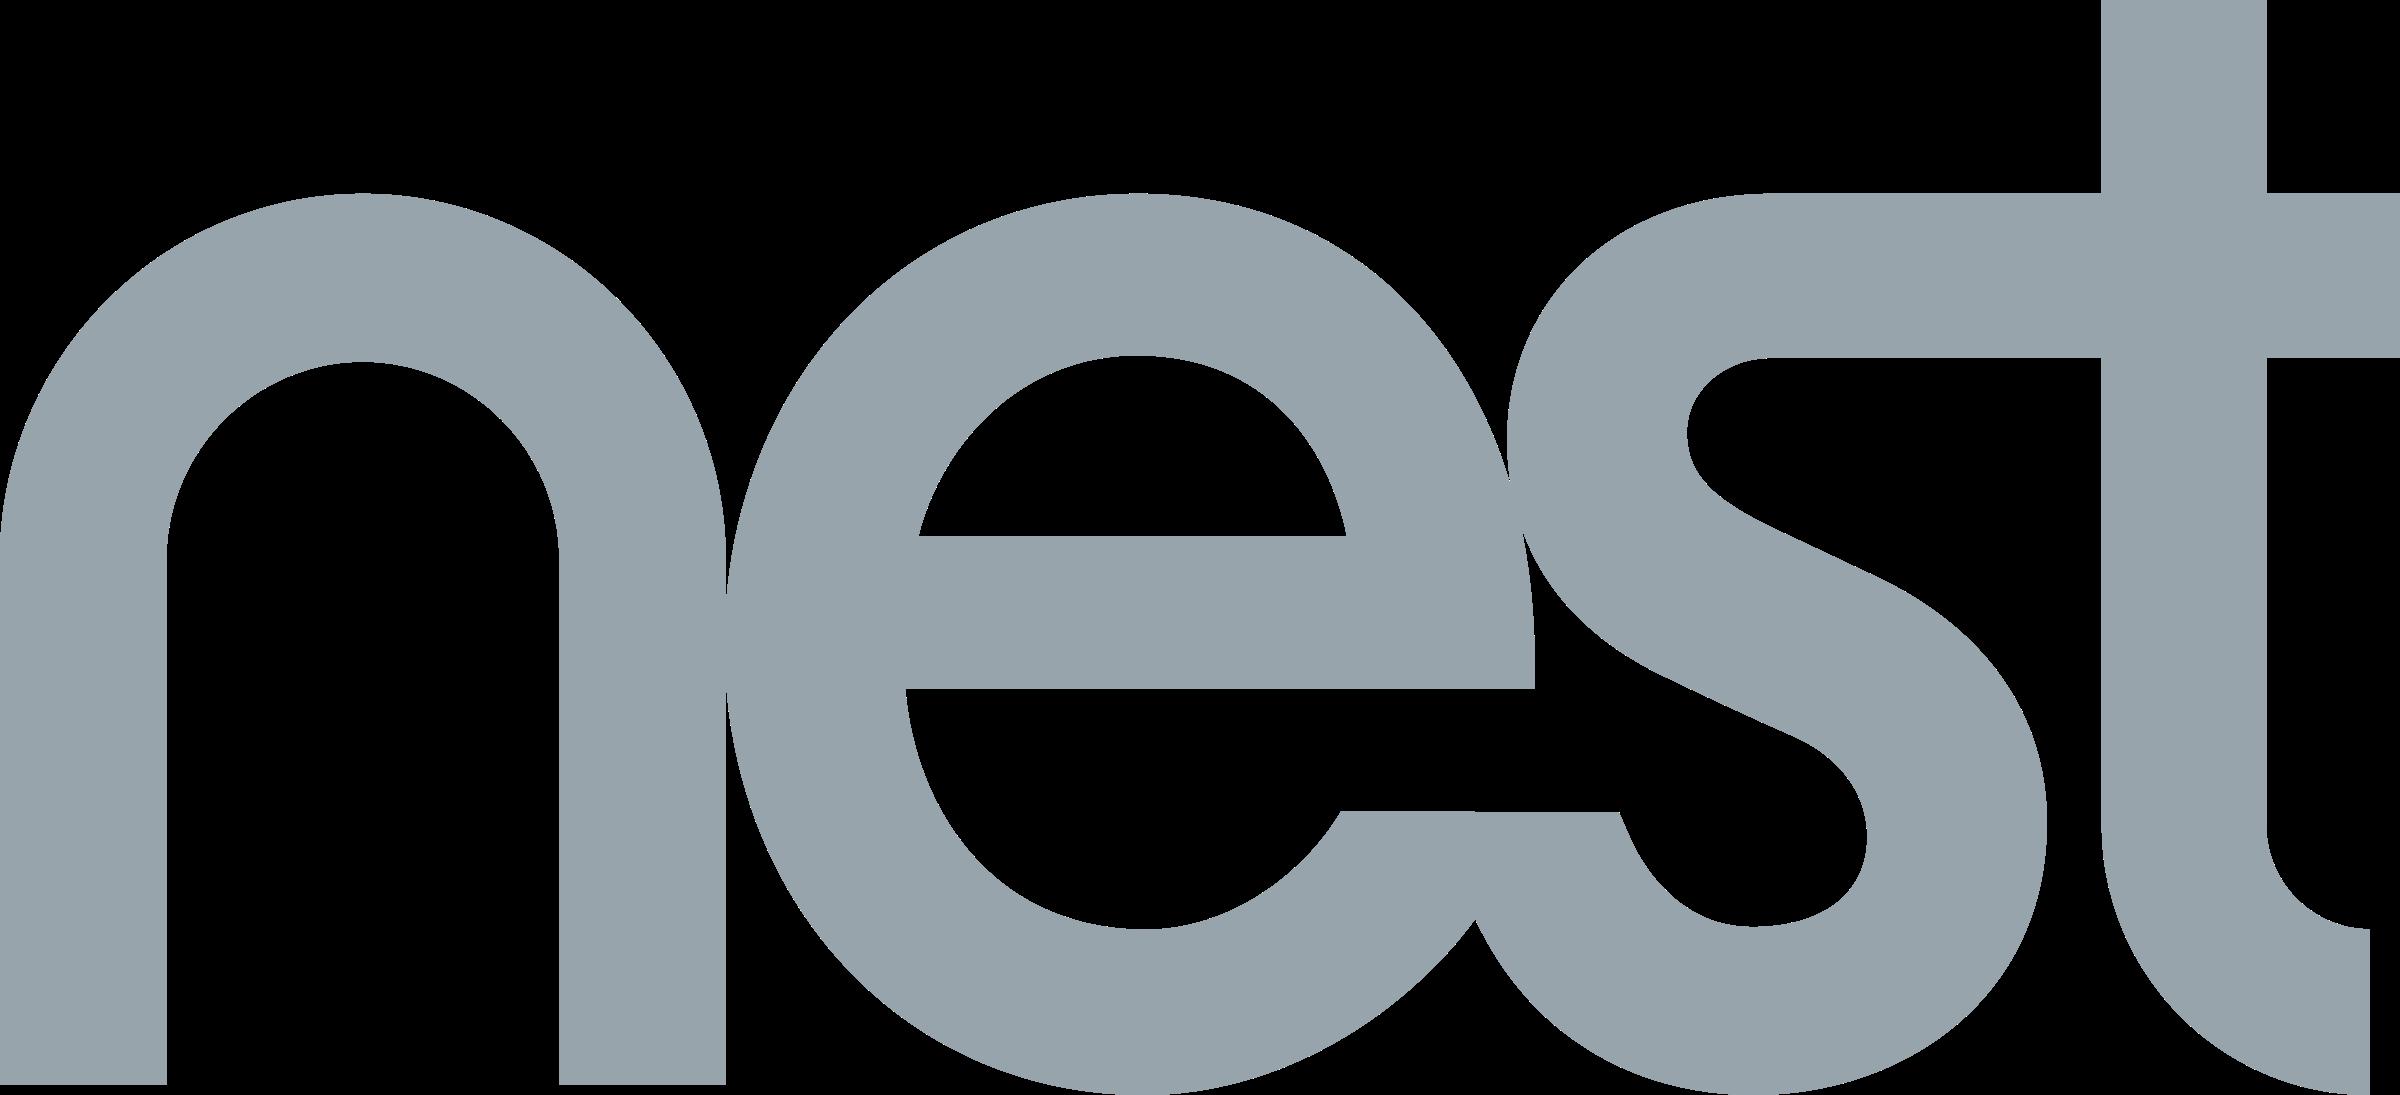 Labs logo png transparent. Nest clipart svg